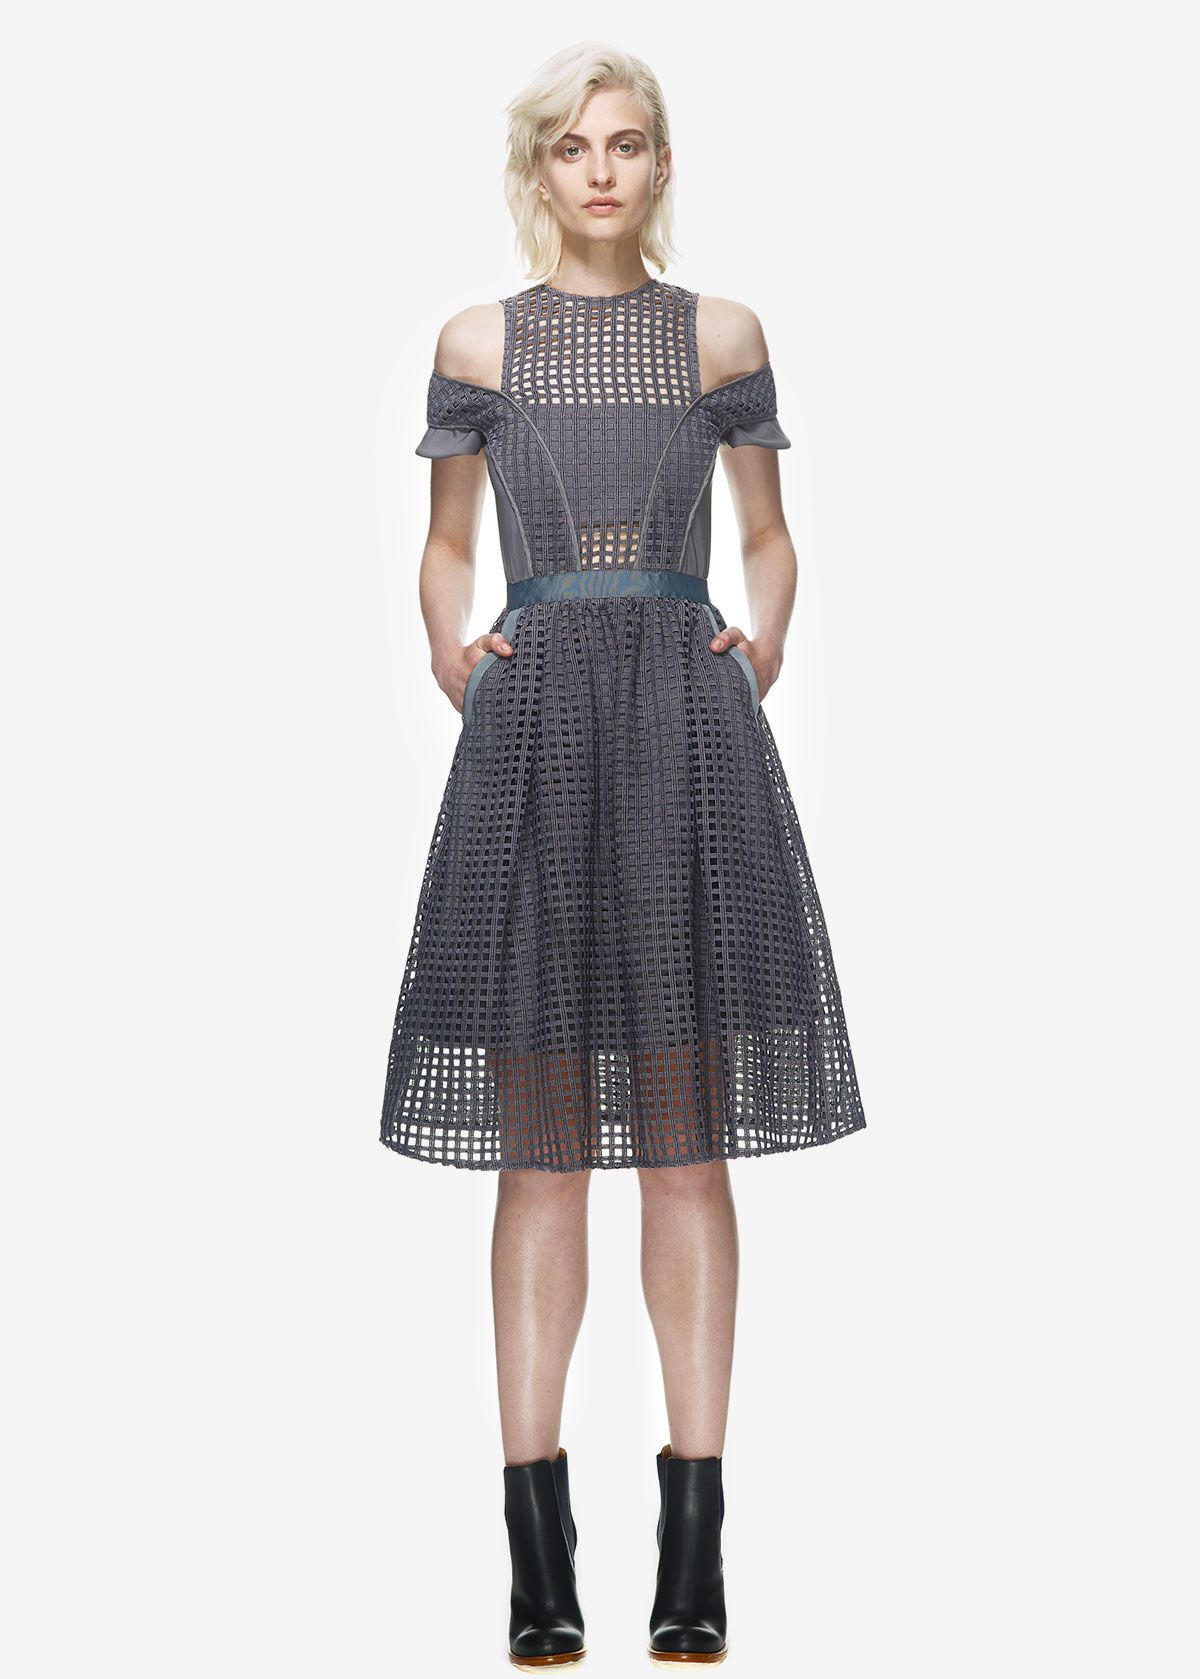 ba172933241d collection : stardust dress   MATERIALISM <3   Fashion, Dresses ...